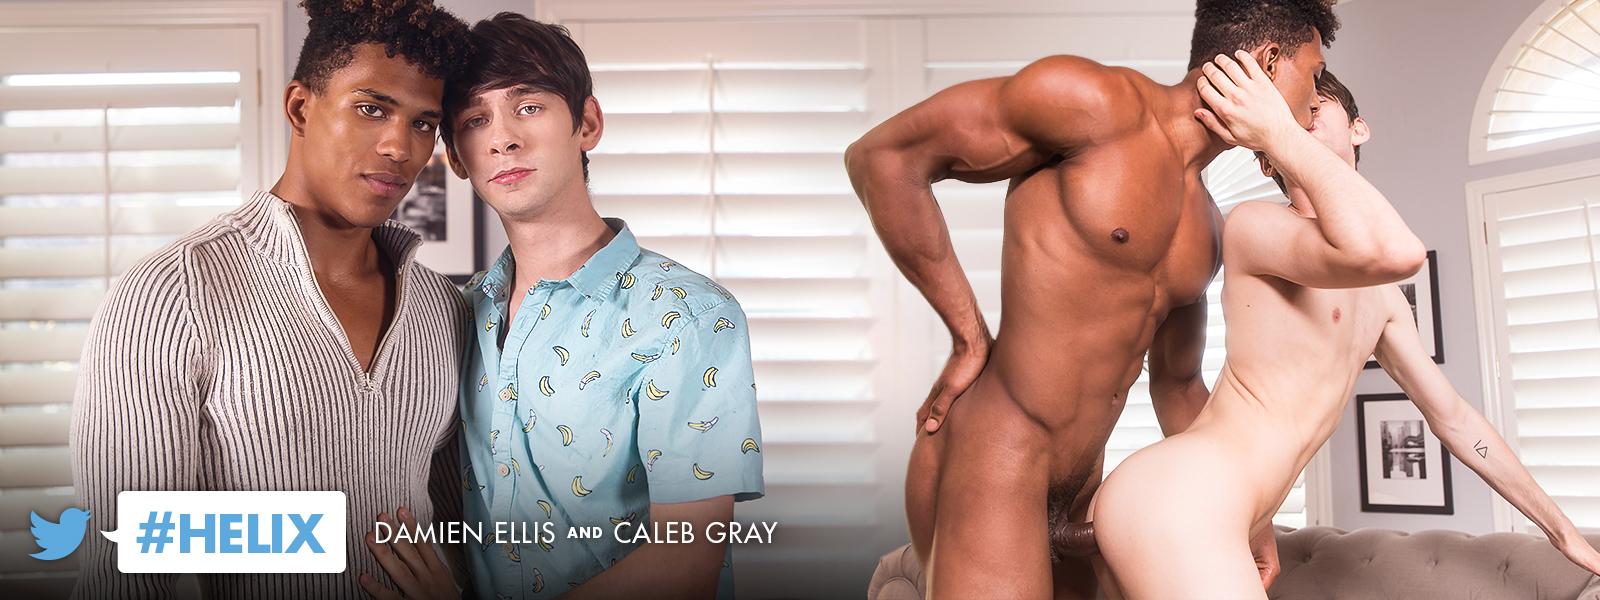 #Helix: Damien Ellis and Caleb Gray